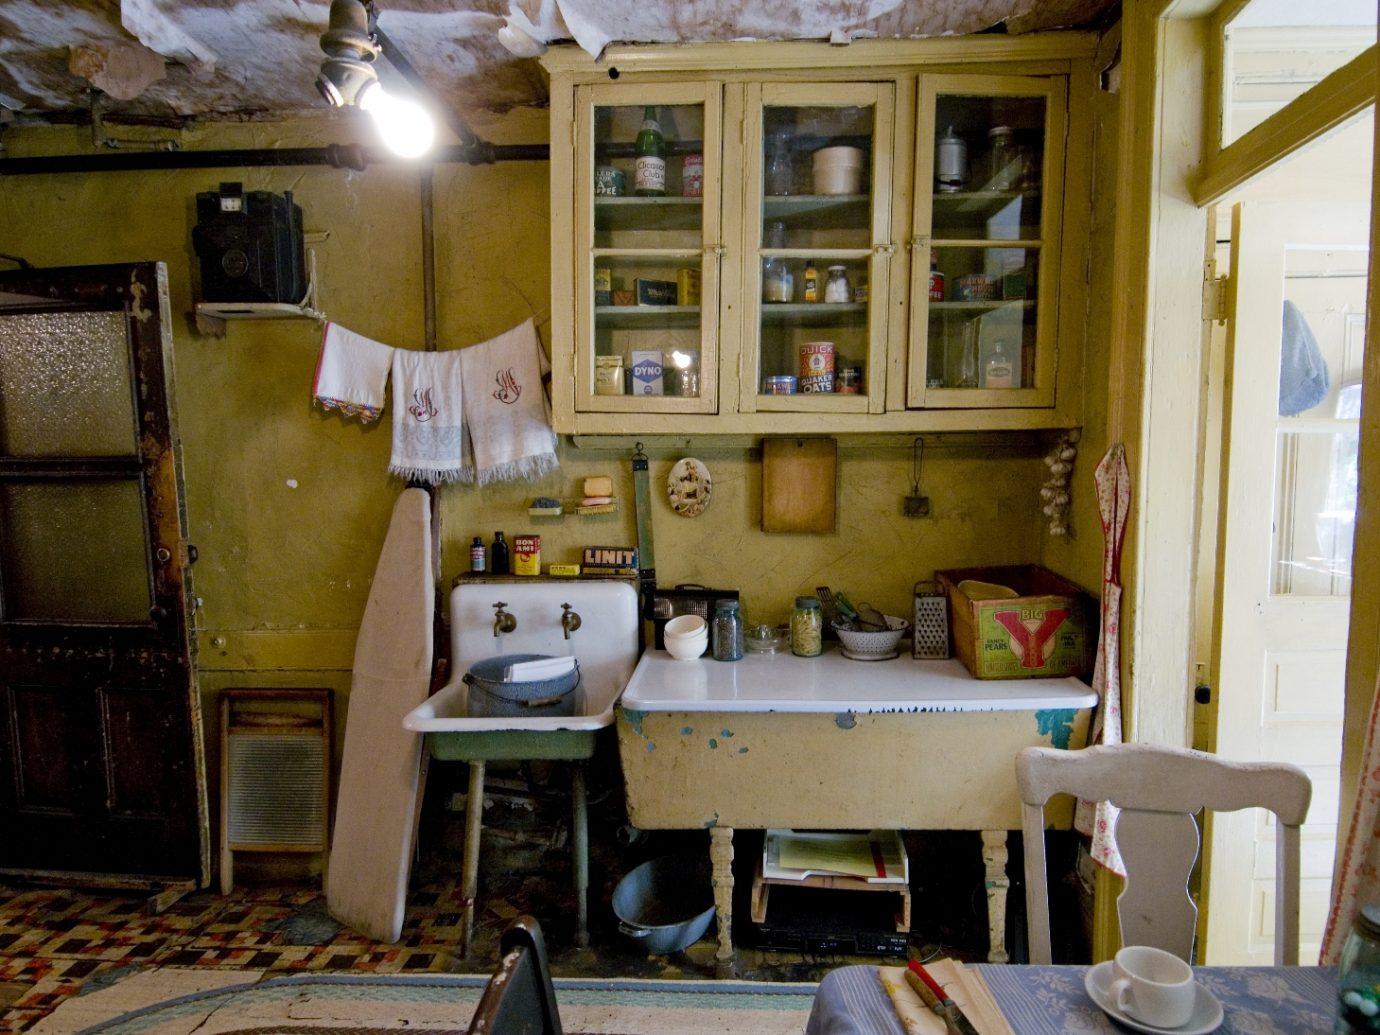 Room in Tenement Museum in NYC